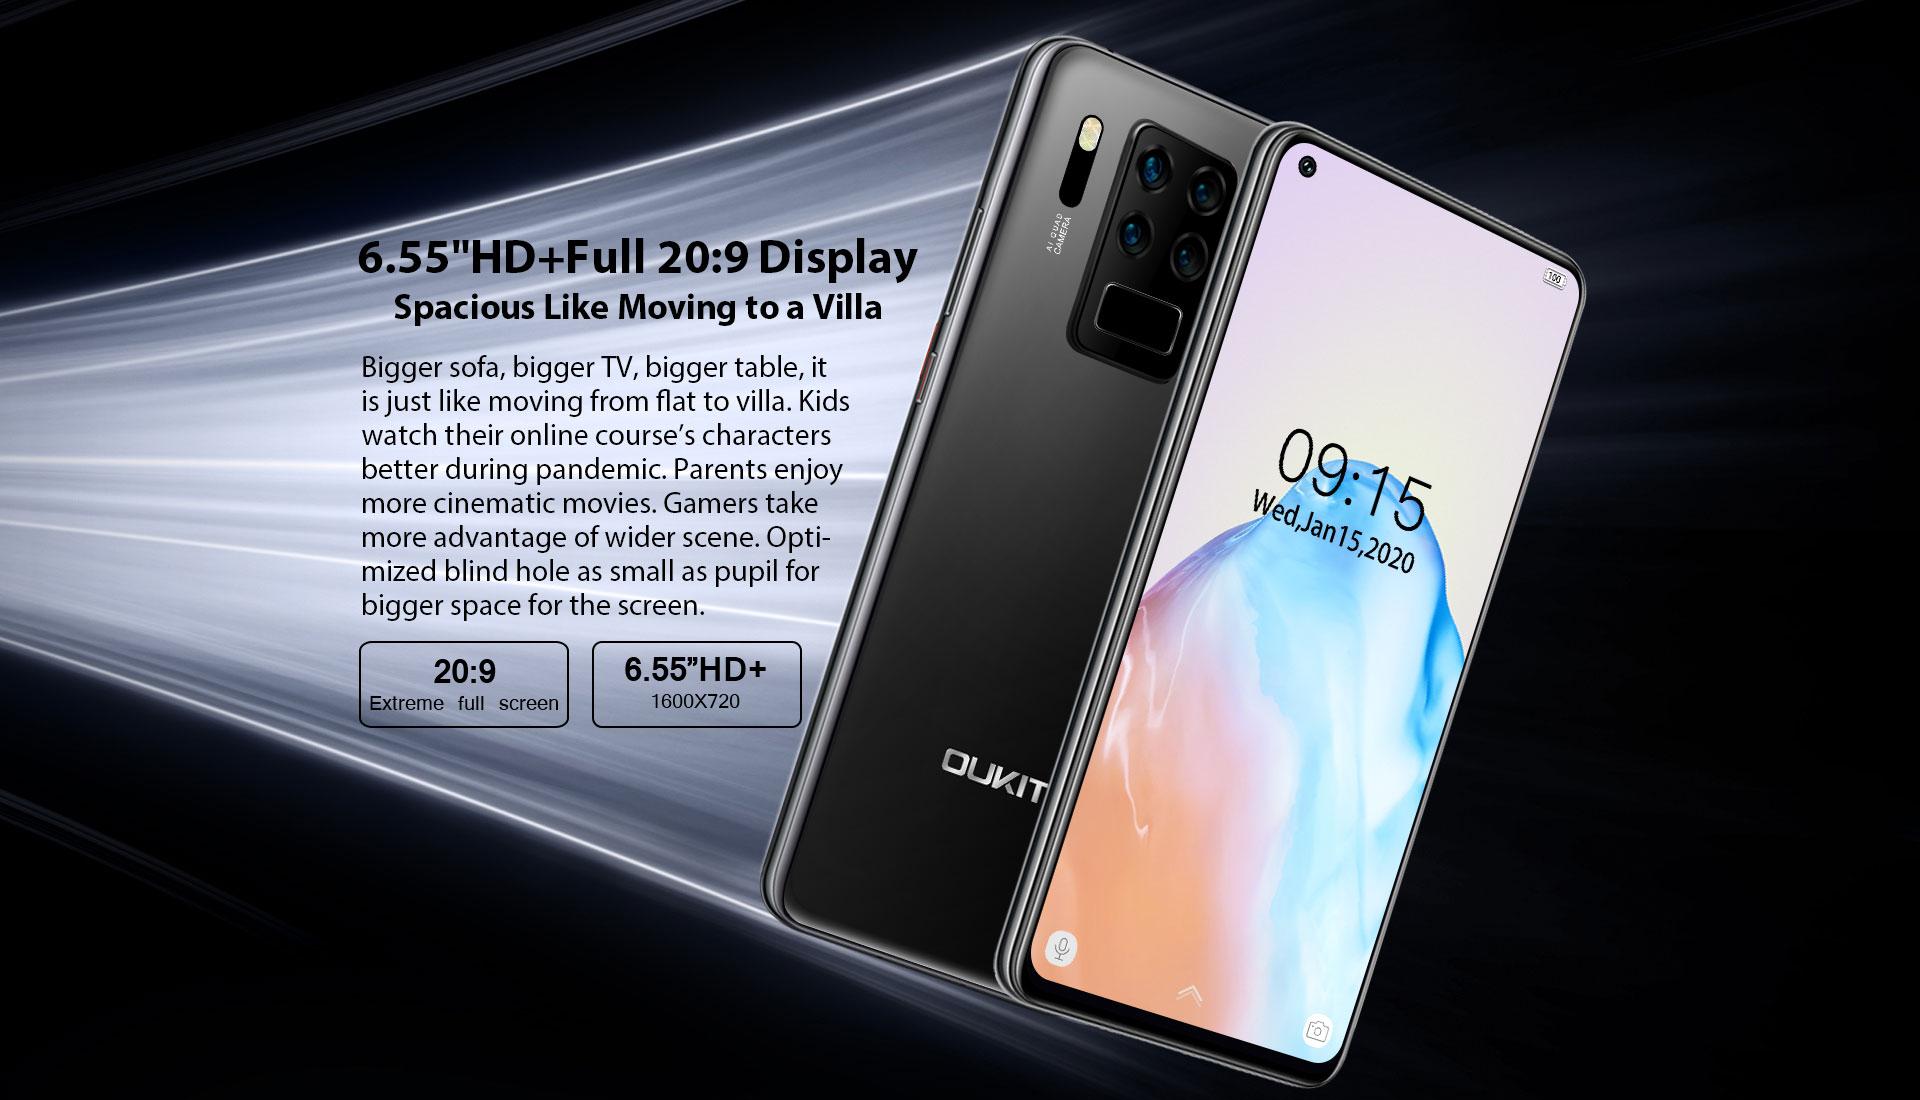 c18-pro-display.jpg